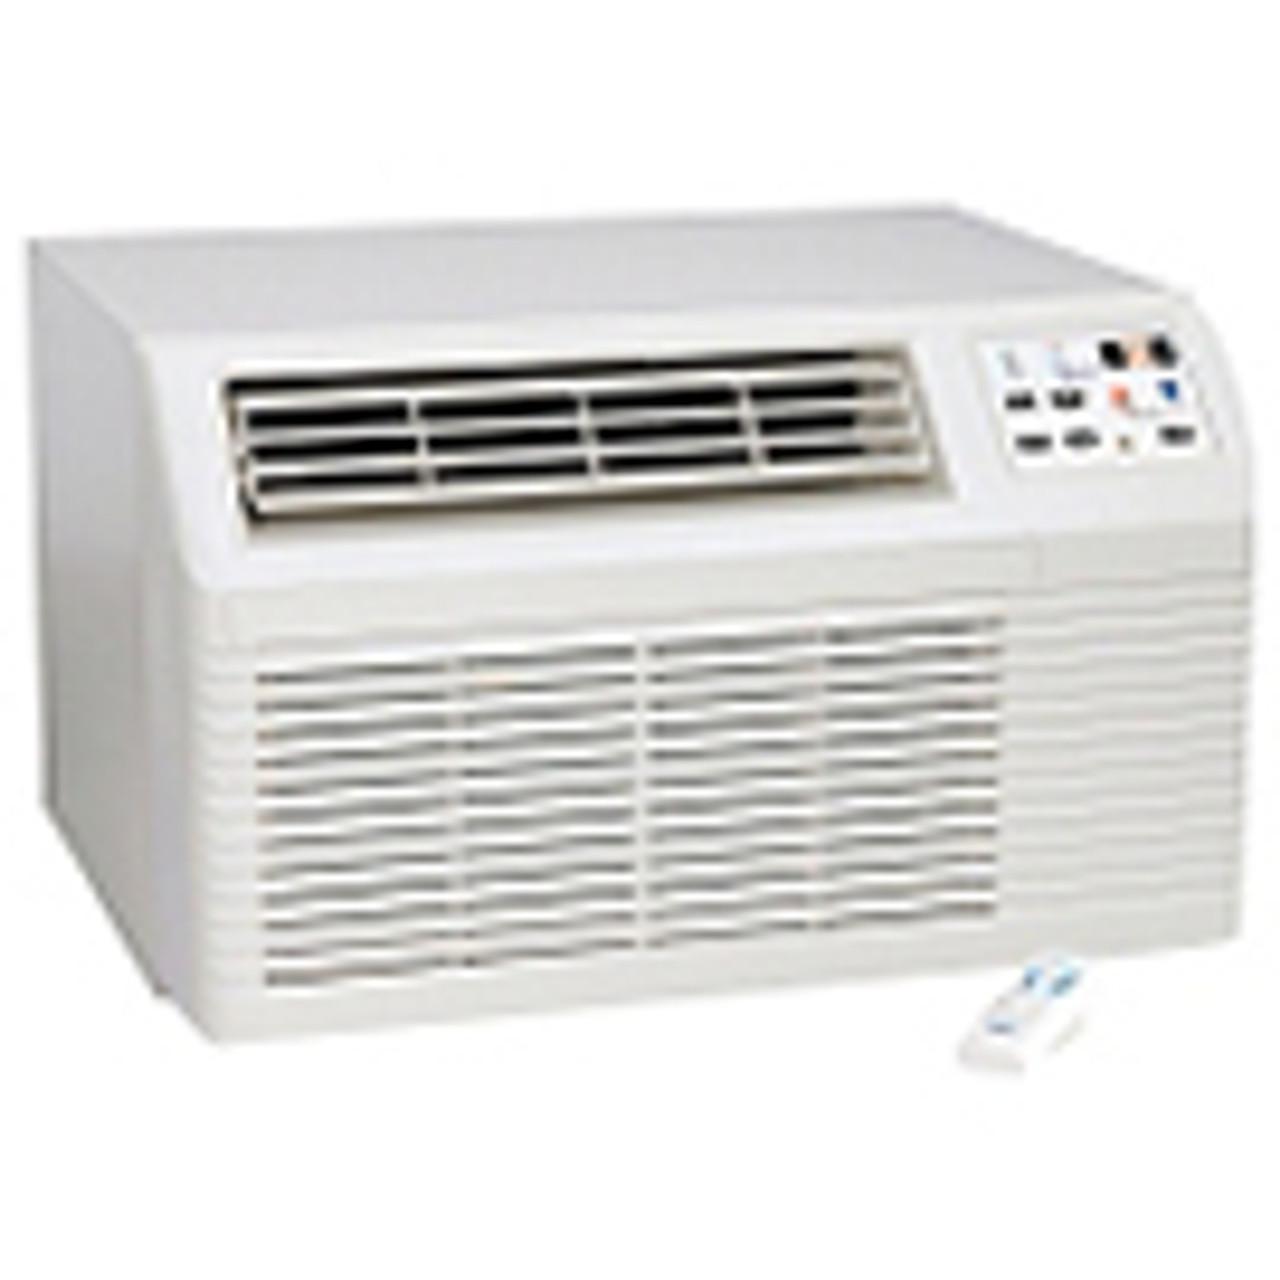 Amana PBH Thru Wall Heat Pump AC Units